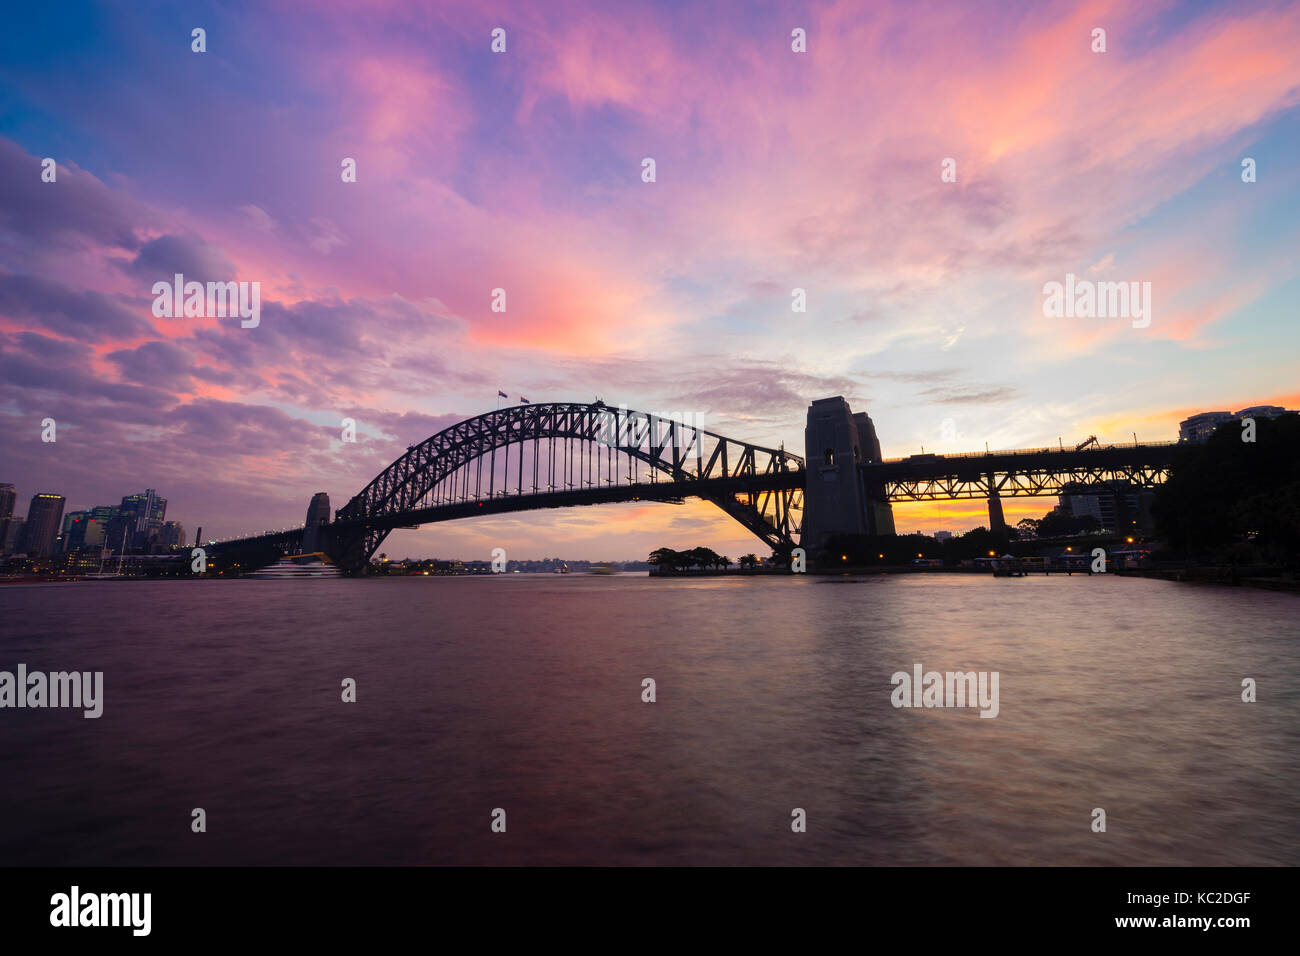 Sydney Harbour Bridge at Sunset Imagen De Stock